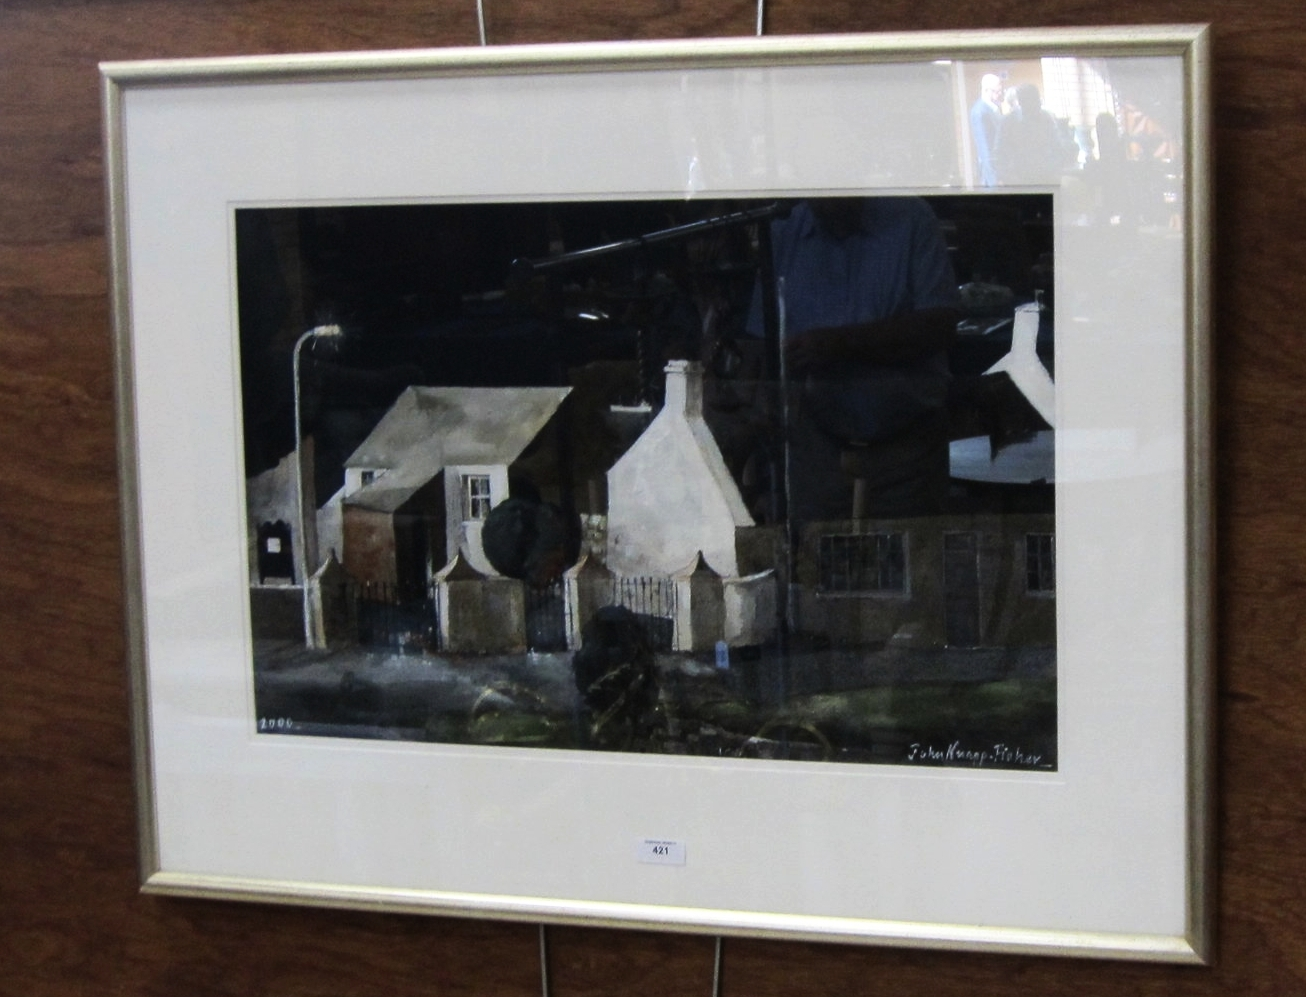 John Knapp-Fisher watercolour £11,000 at auction